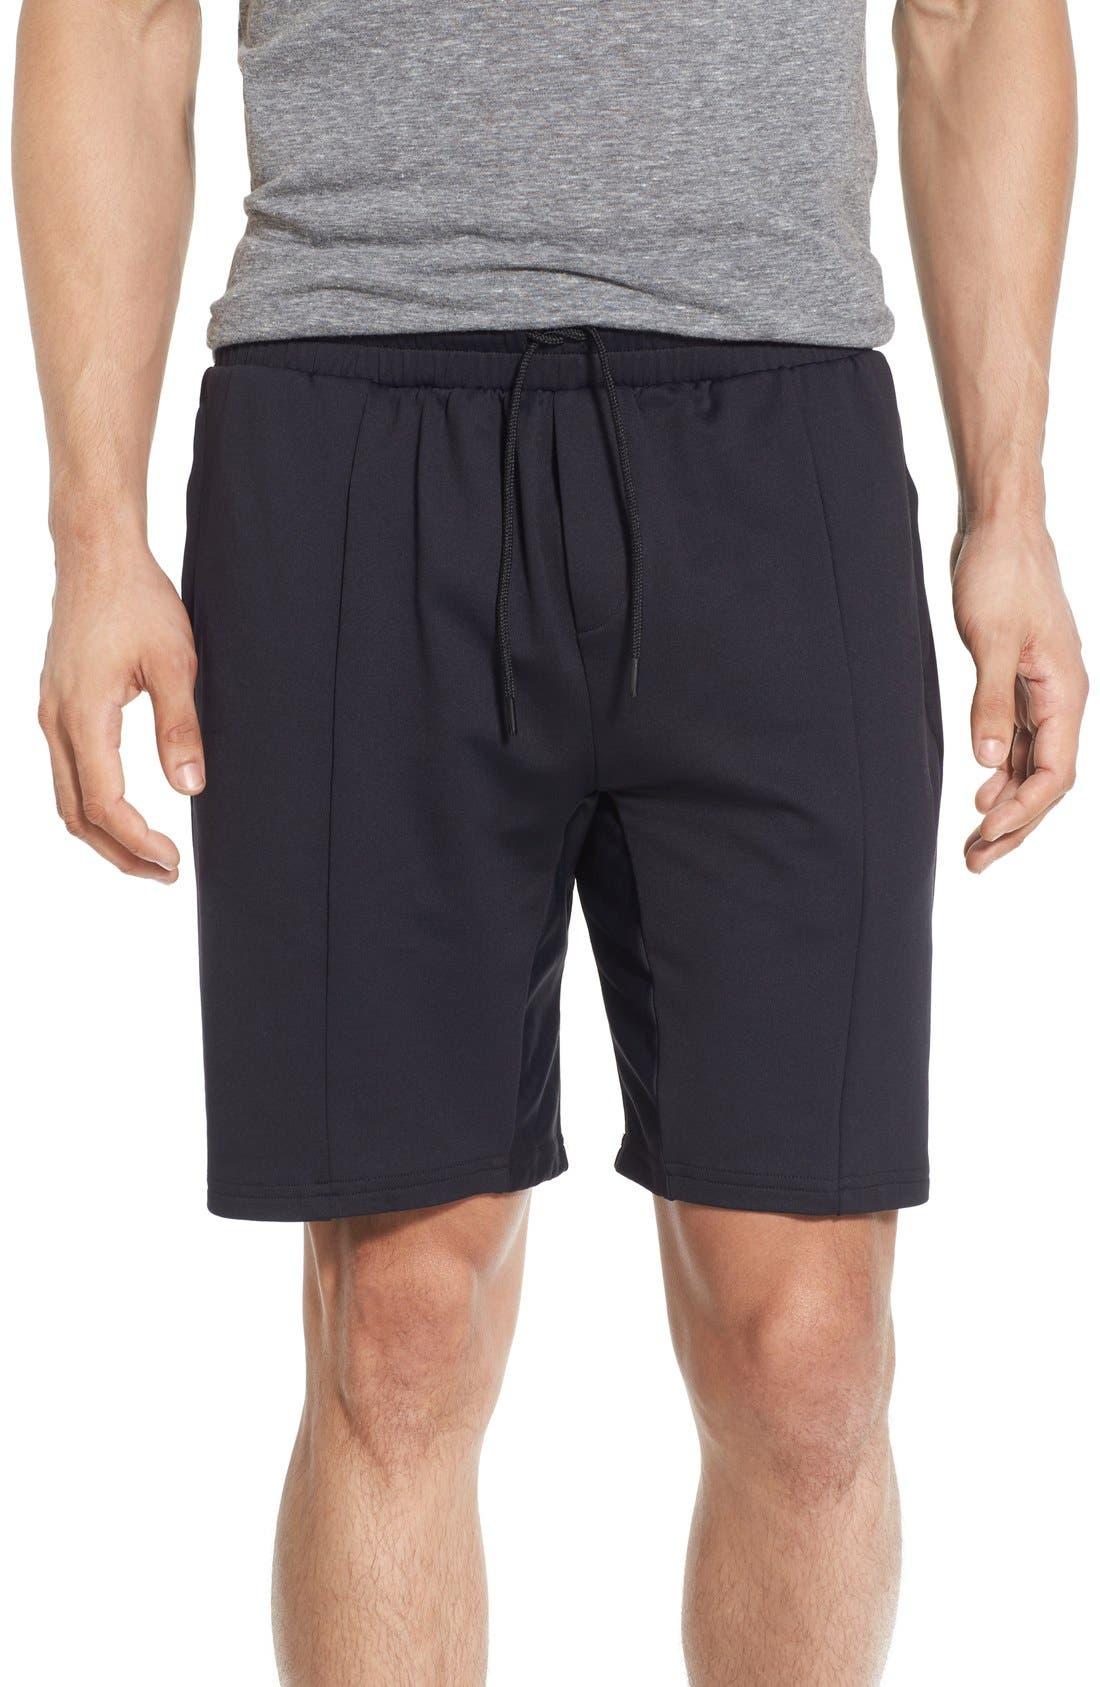 UNCL 'Dart' Sweat Shorts